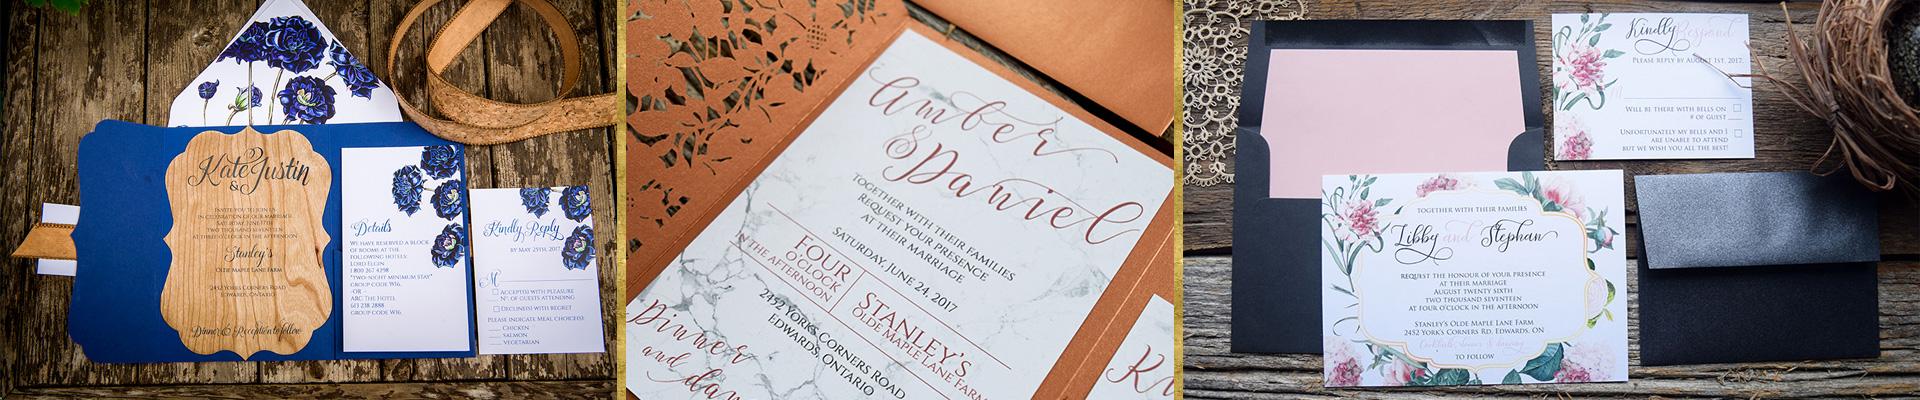 2018 wedding invitations ottawa ontario canada daisy designs stopboris Image collections